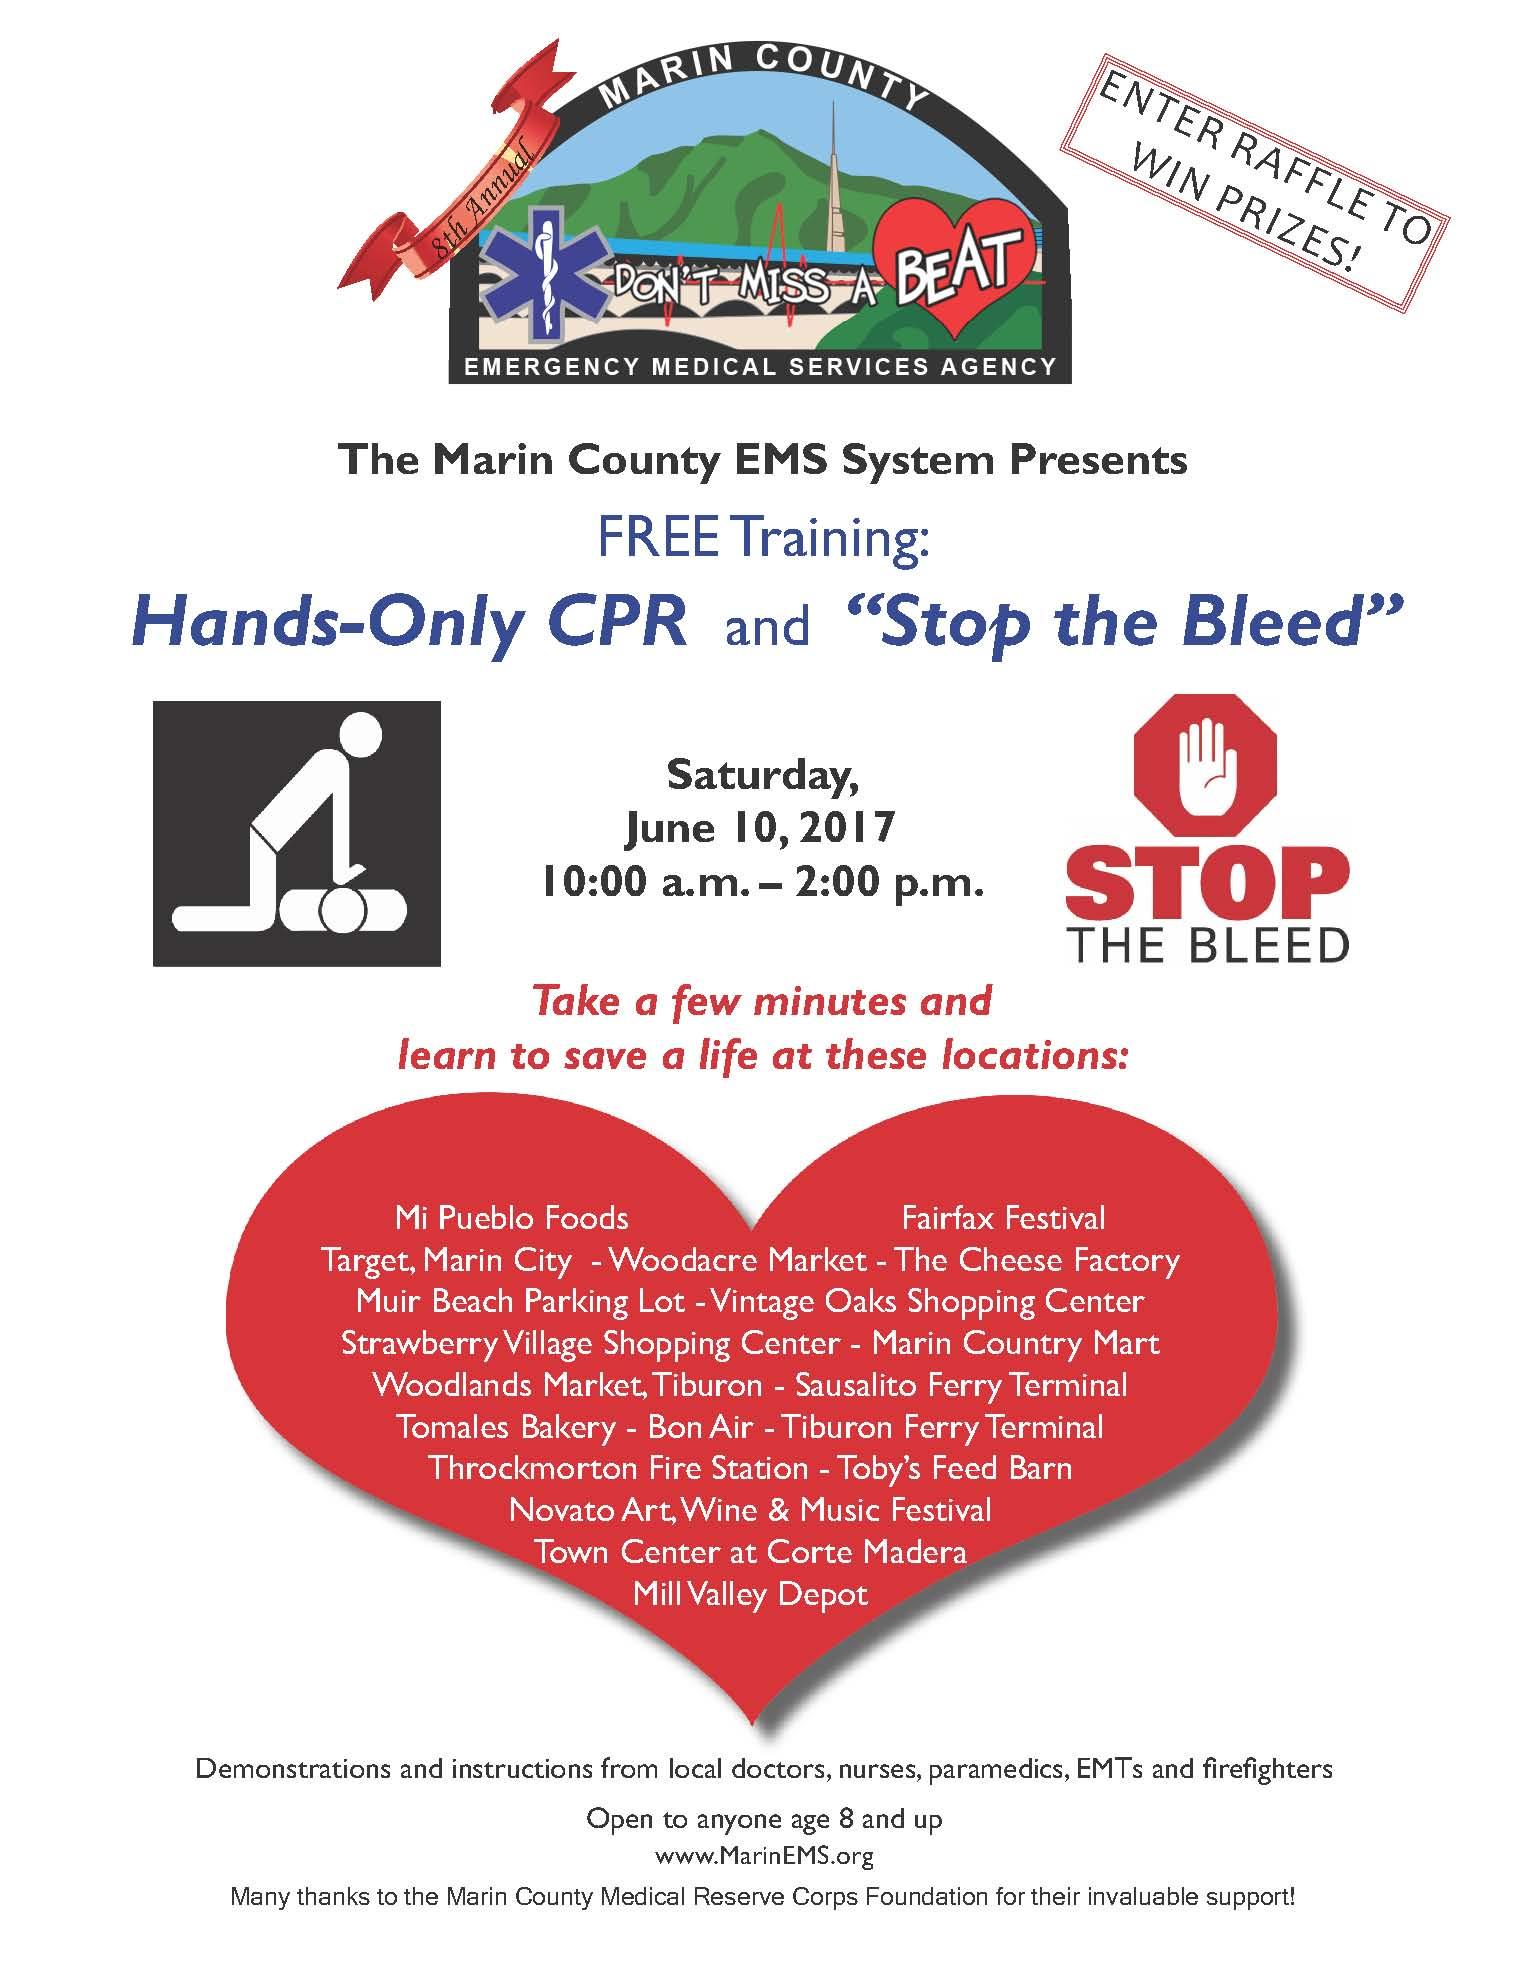 June 10, 2017: Hands-Only CPR